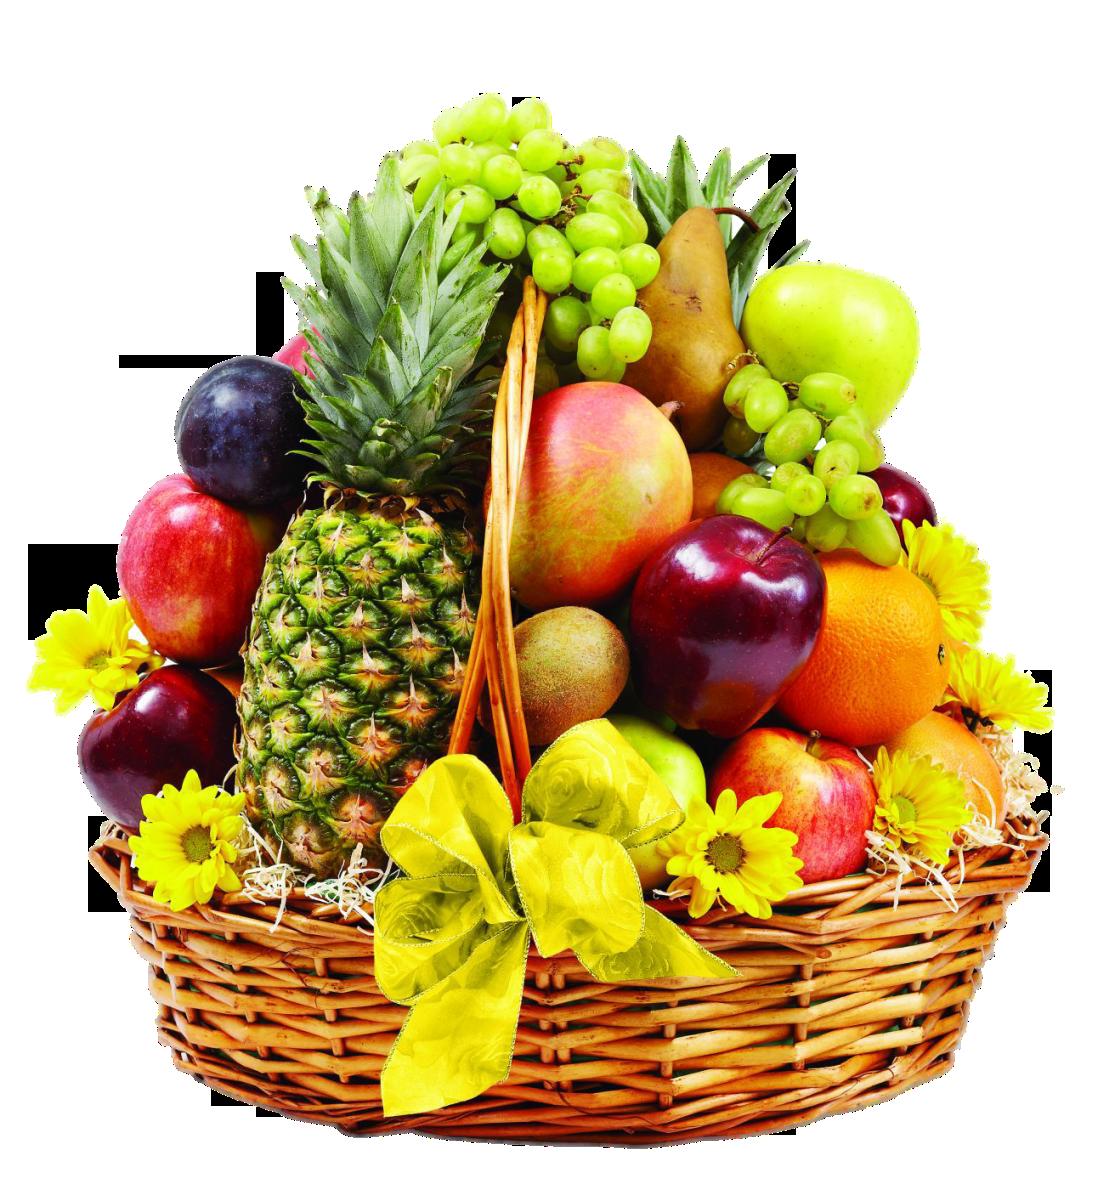 mix fruits png transparent background images | fruit | pinterest